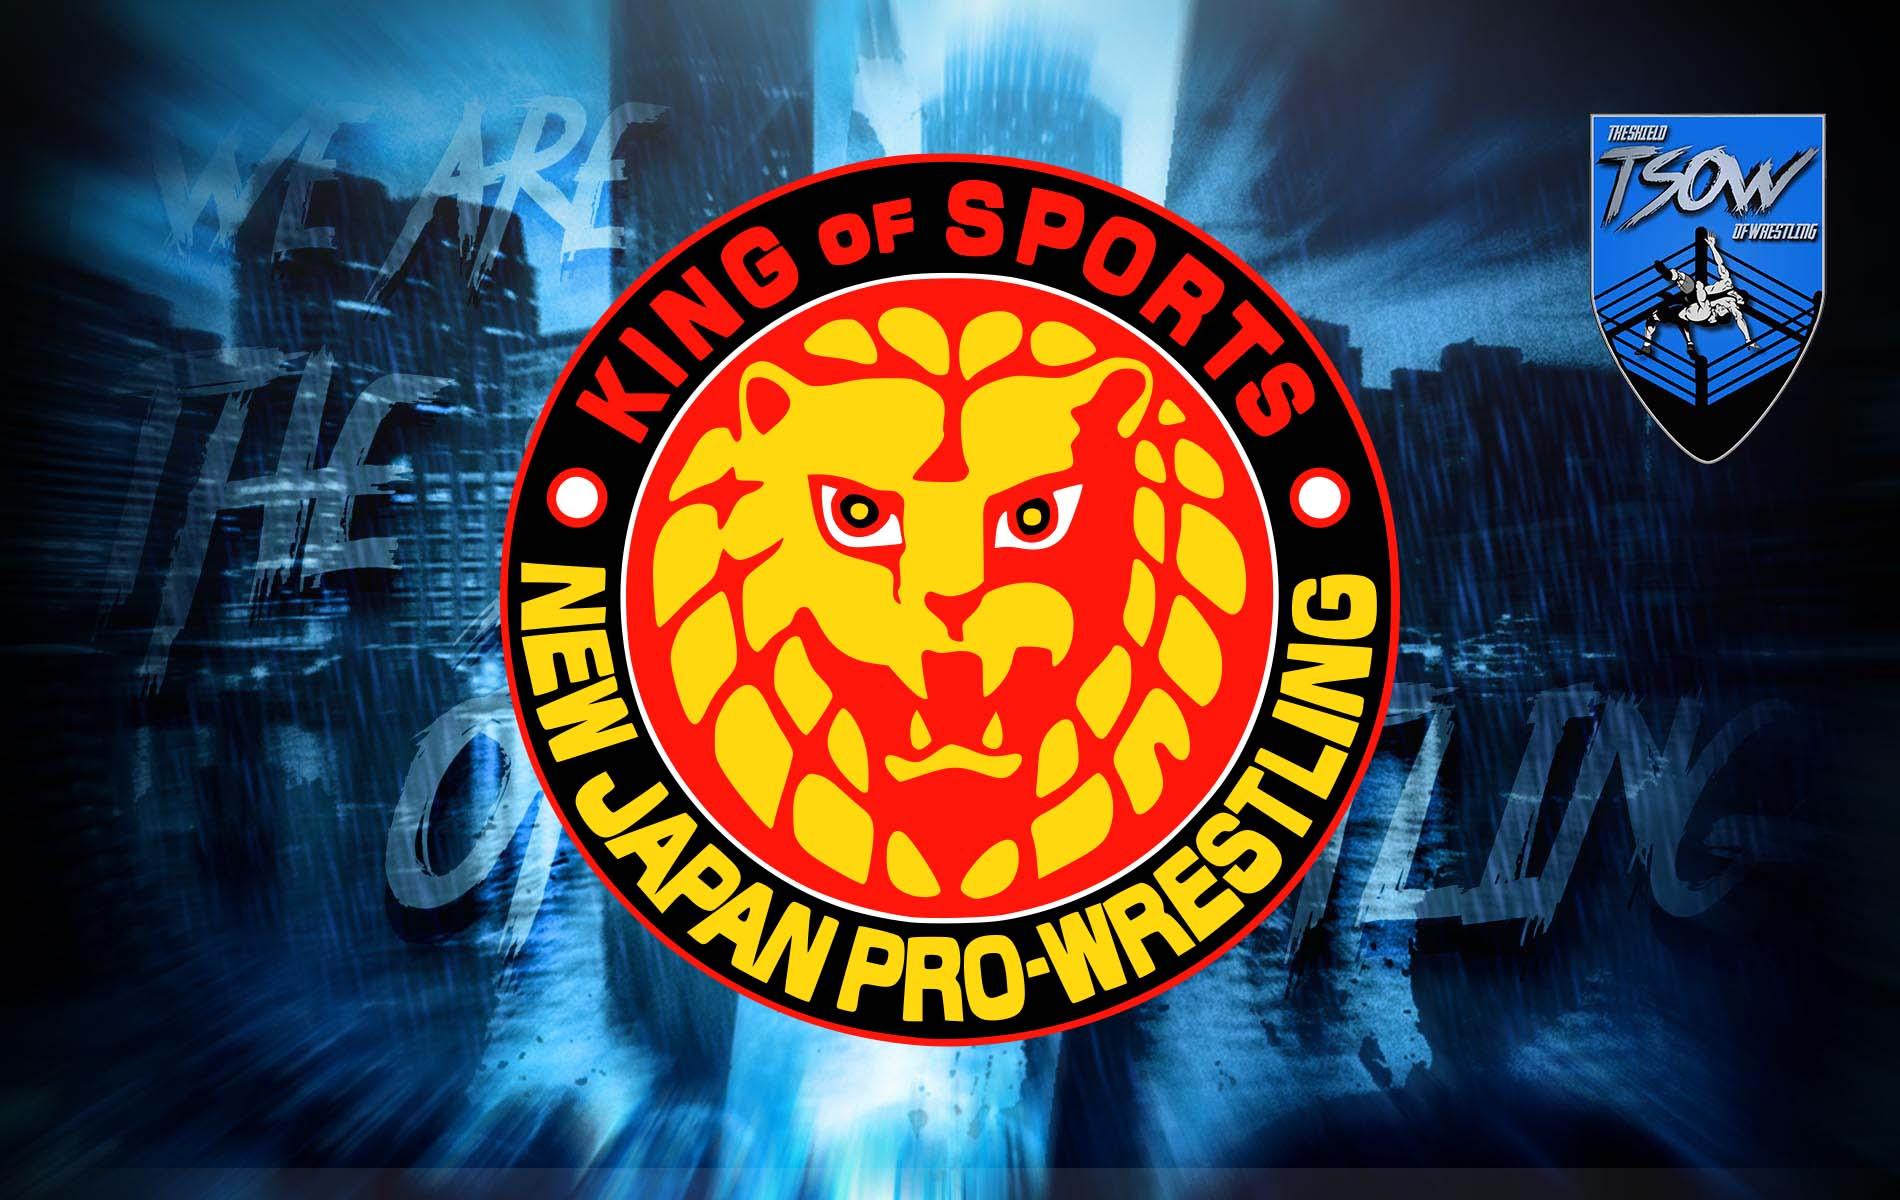 NJPW: Tetsuya Naito ha rotto il trofeo del BoSJ 27?